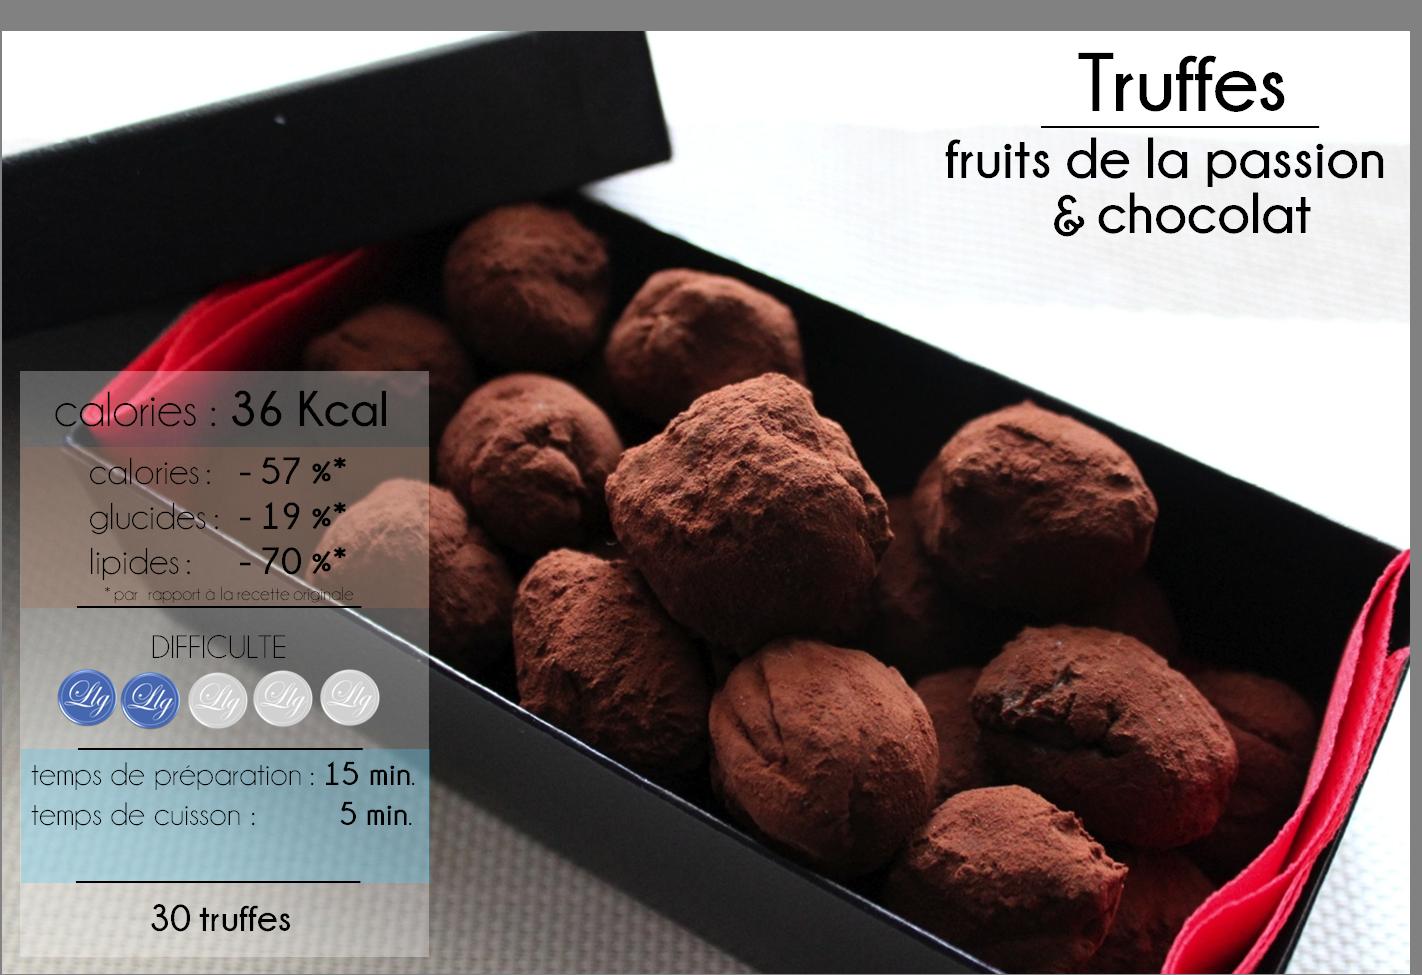 truffe chocolat passion